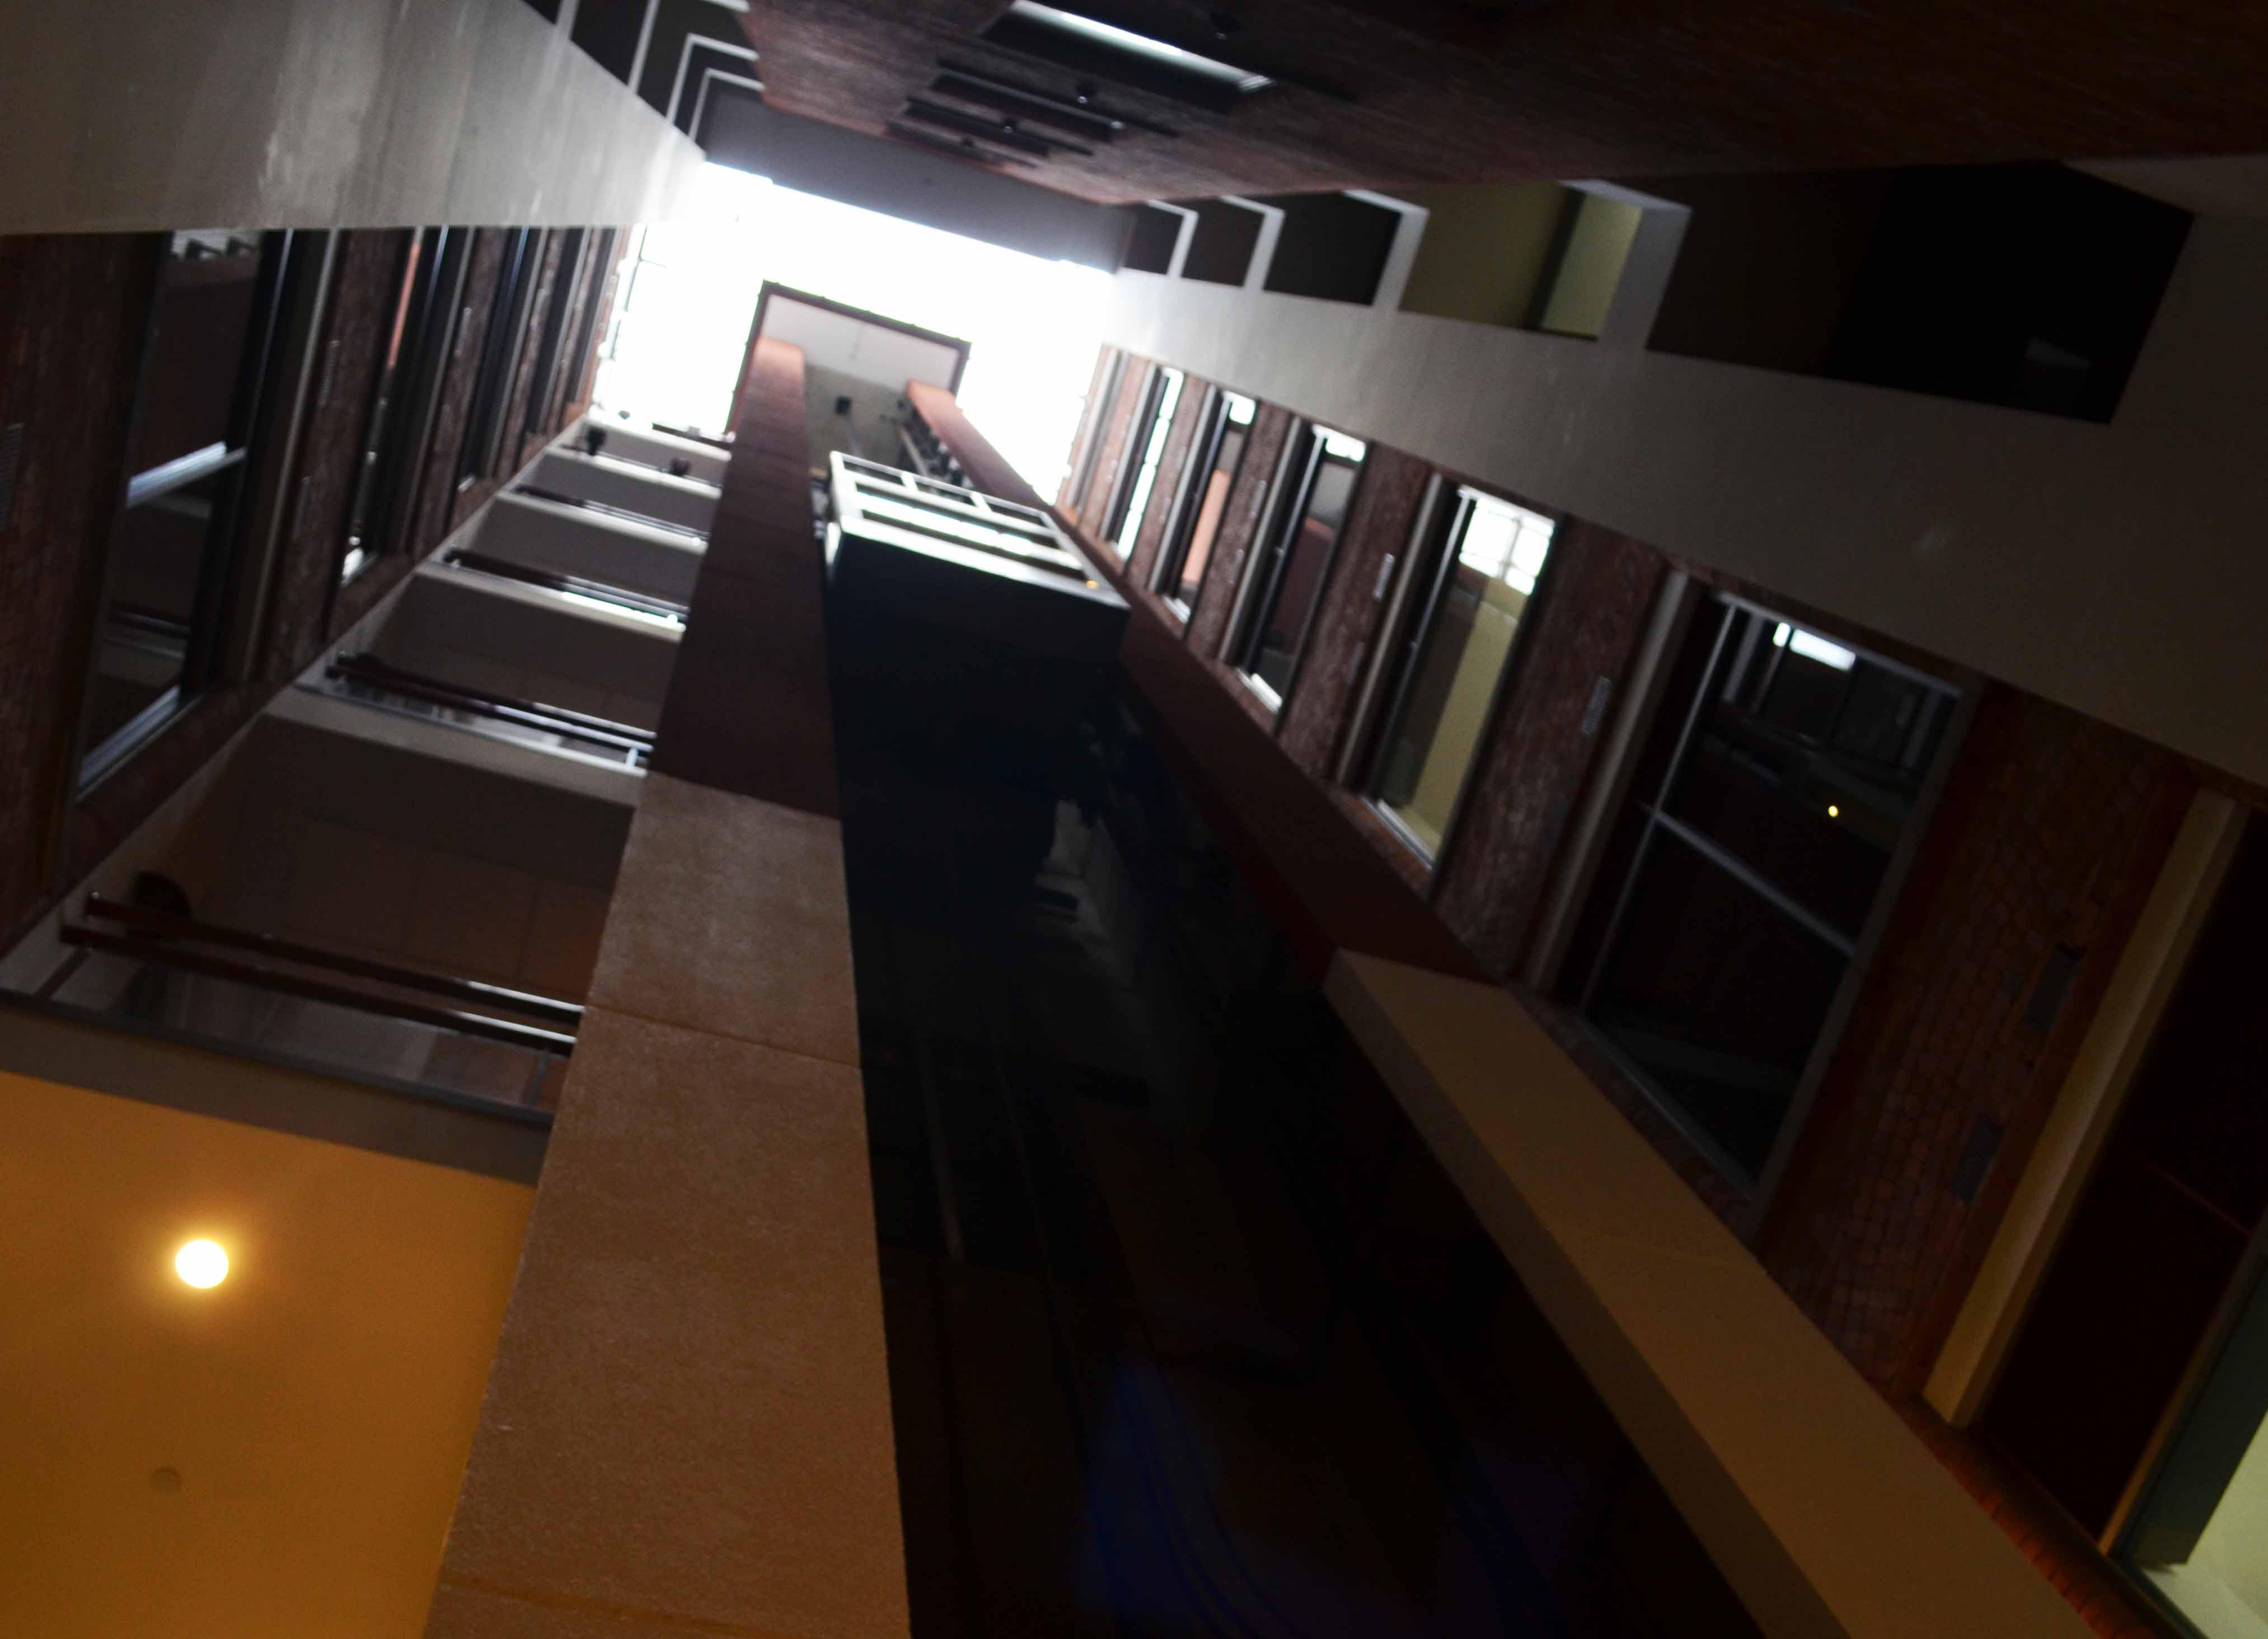 File:Light Well, Lombard Building.jpg